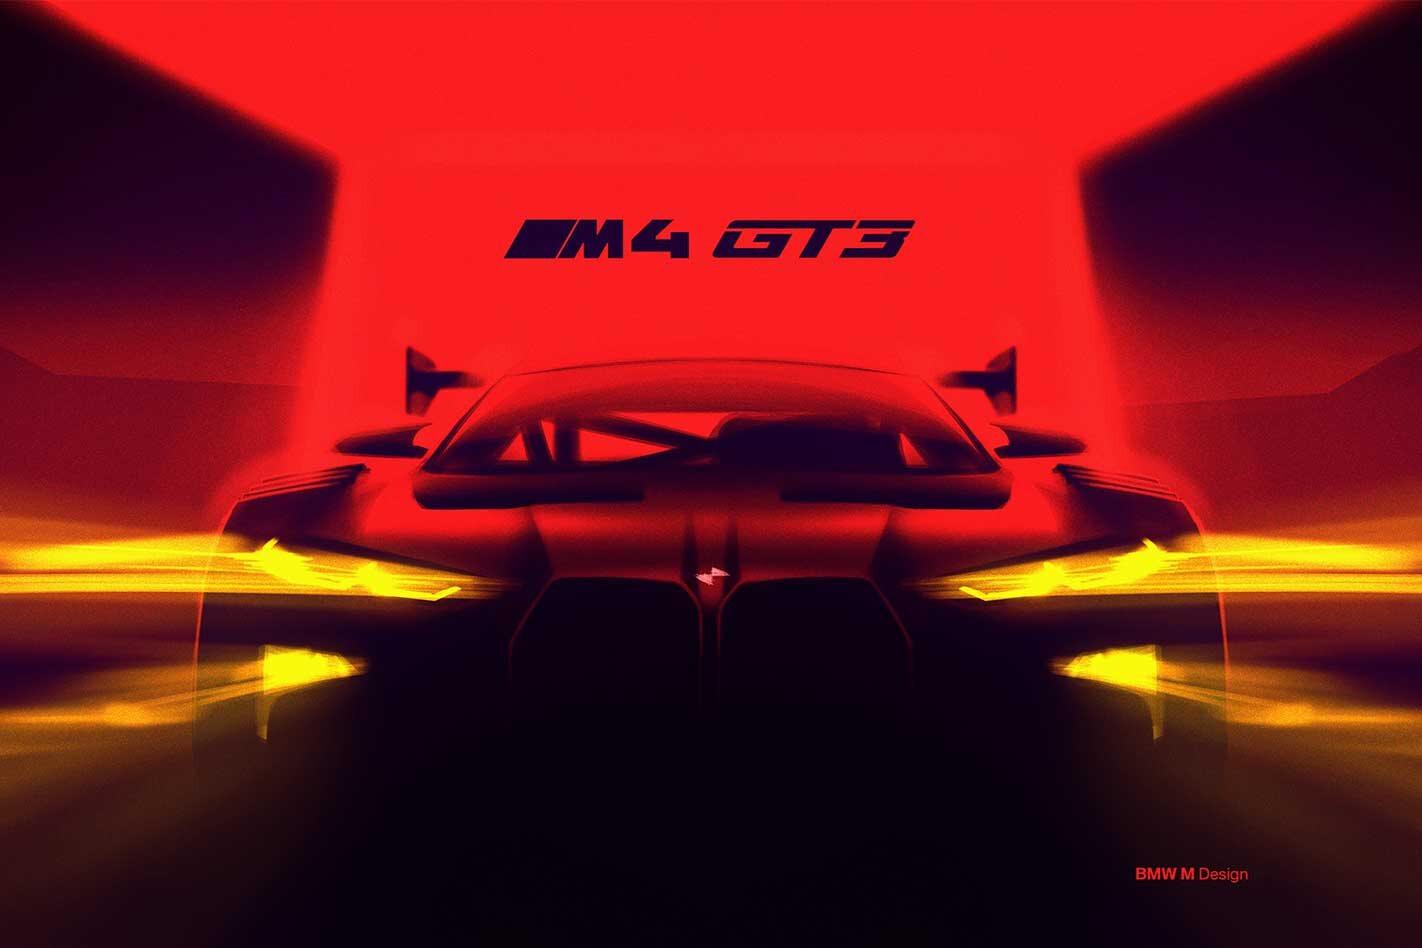 BMW M4 GT3 teased